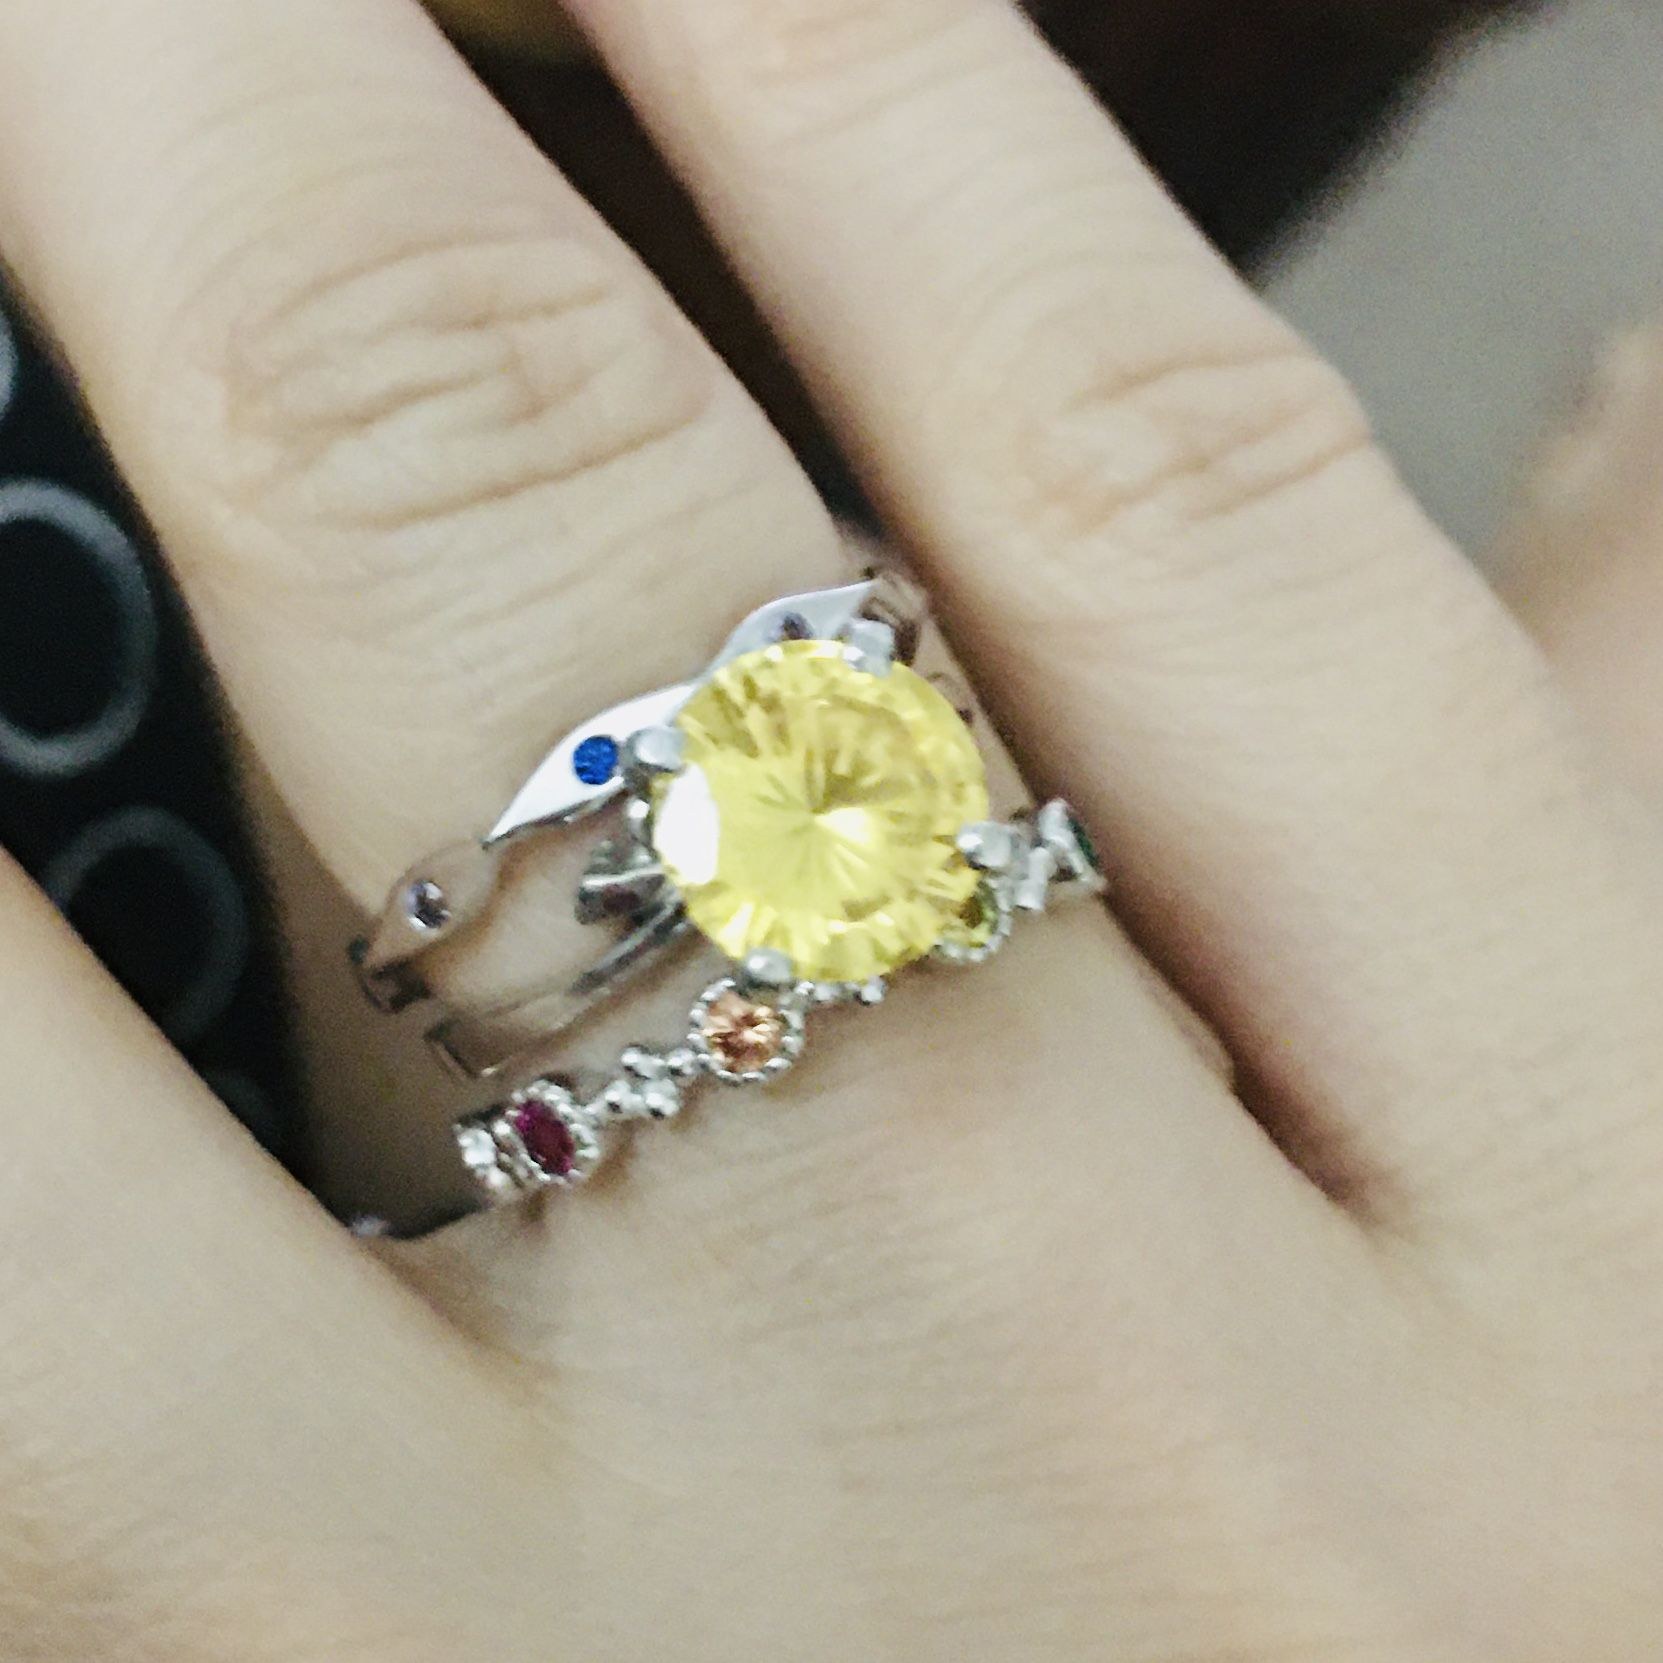 Pin by Gossamer Bay on My Jewelry in 2020 My jewellery